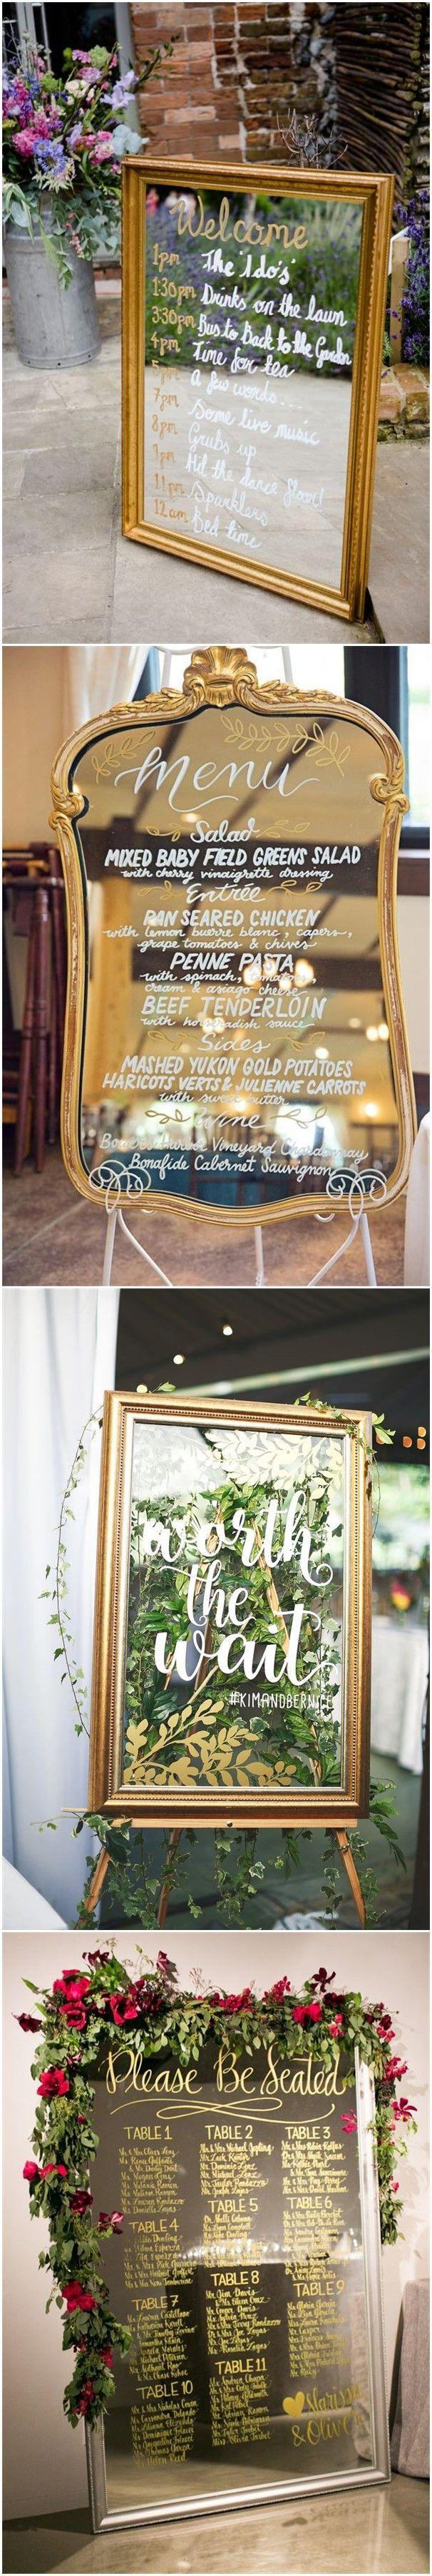 Wedding decoration ideas home  Wedding Decorations   Vintage Mirror Wedding Sign Decoration